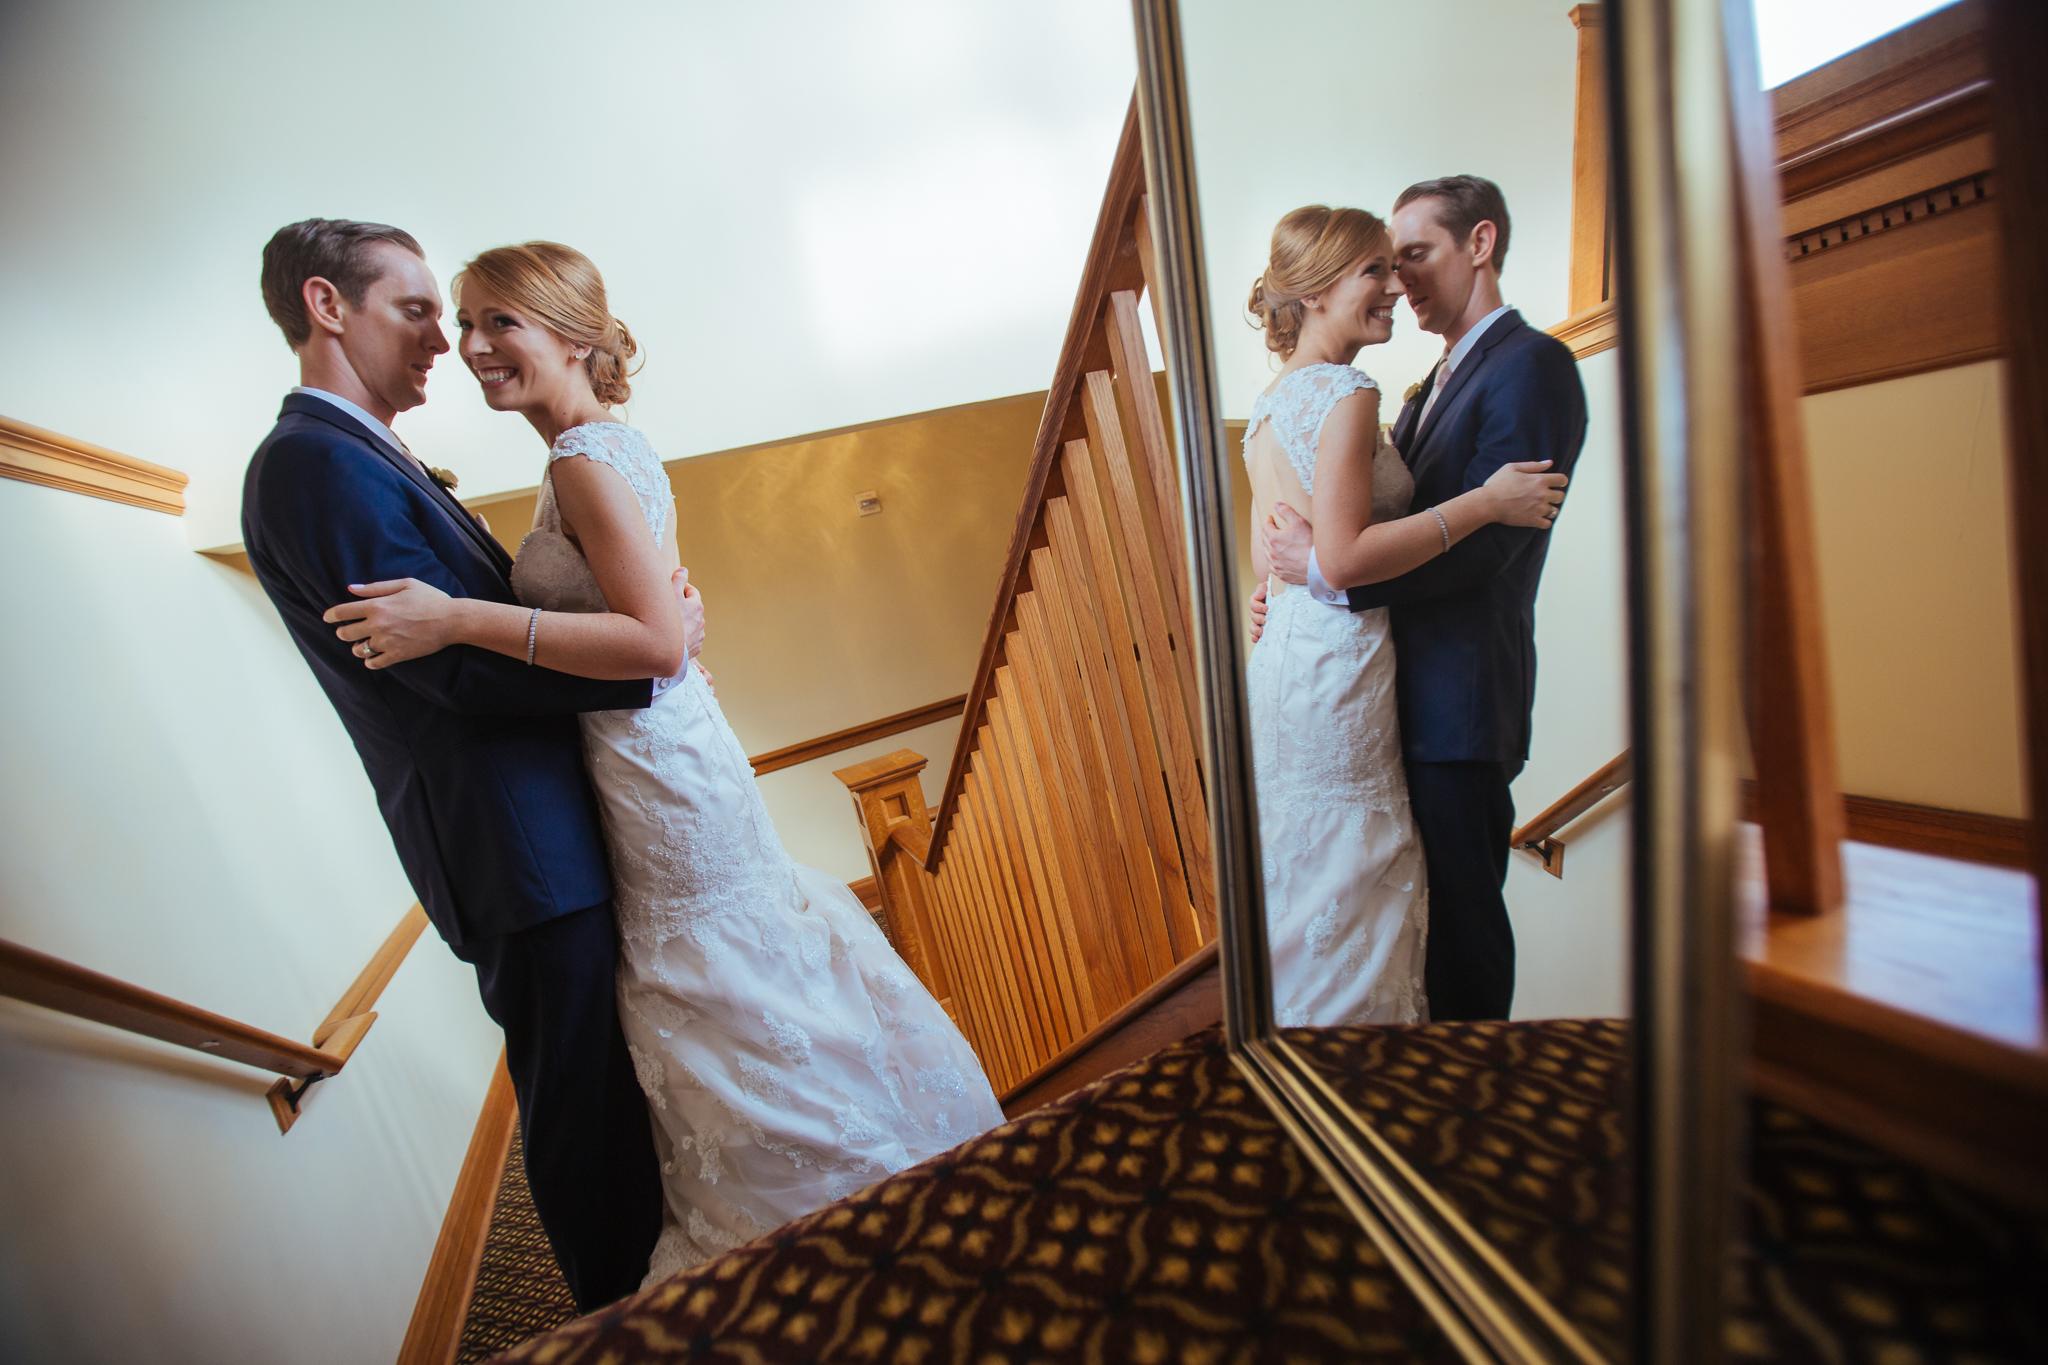 Michael and Kelly - the ashton depot - wedding DFW - wedding photographer- elizalde photography (75 of 150).jpg